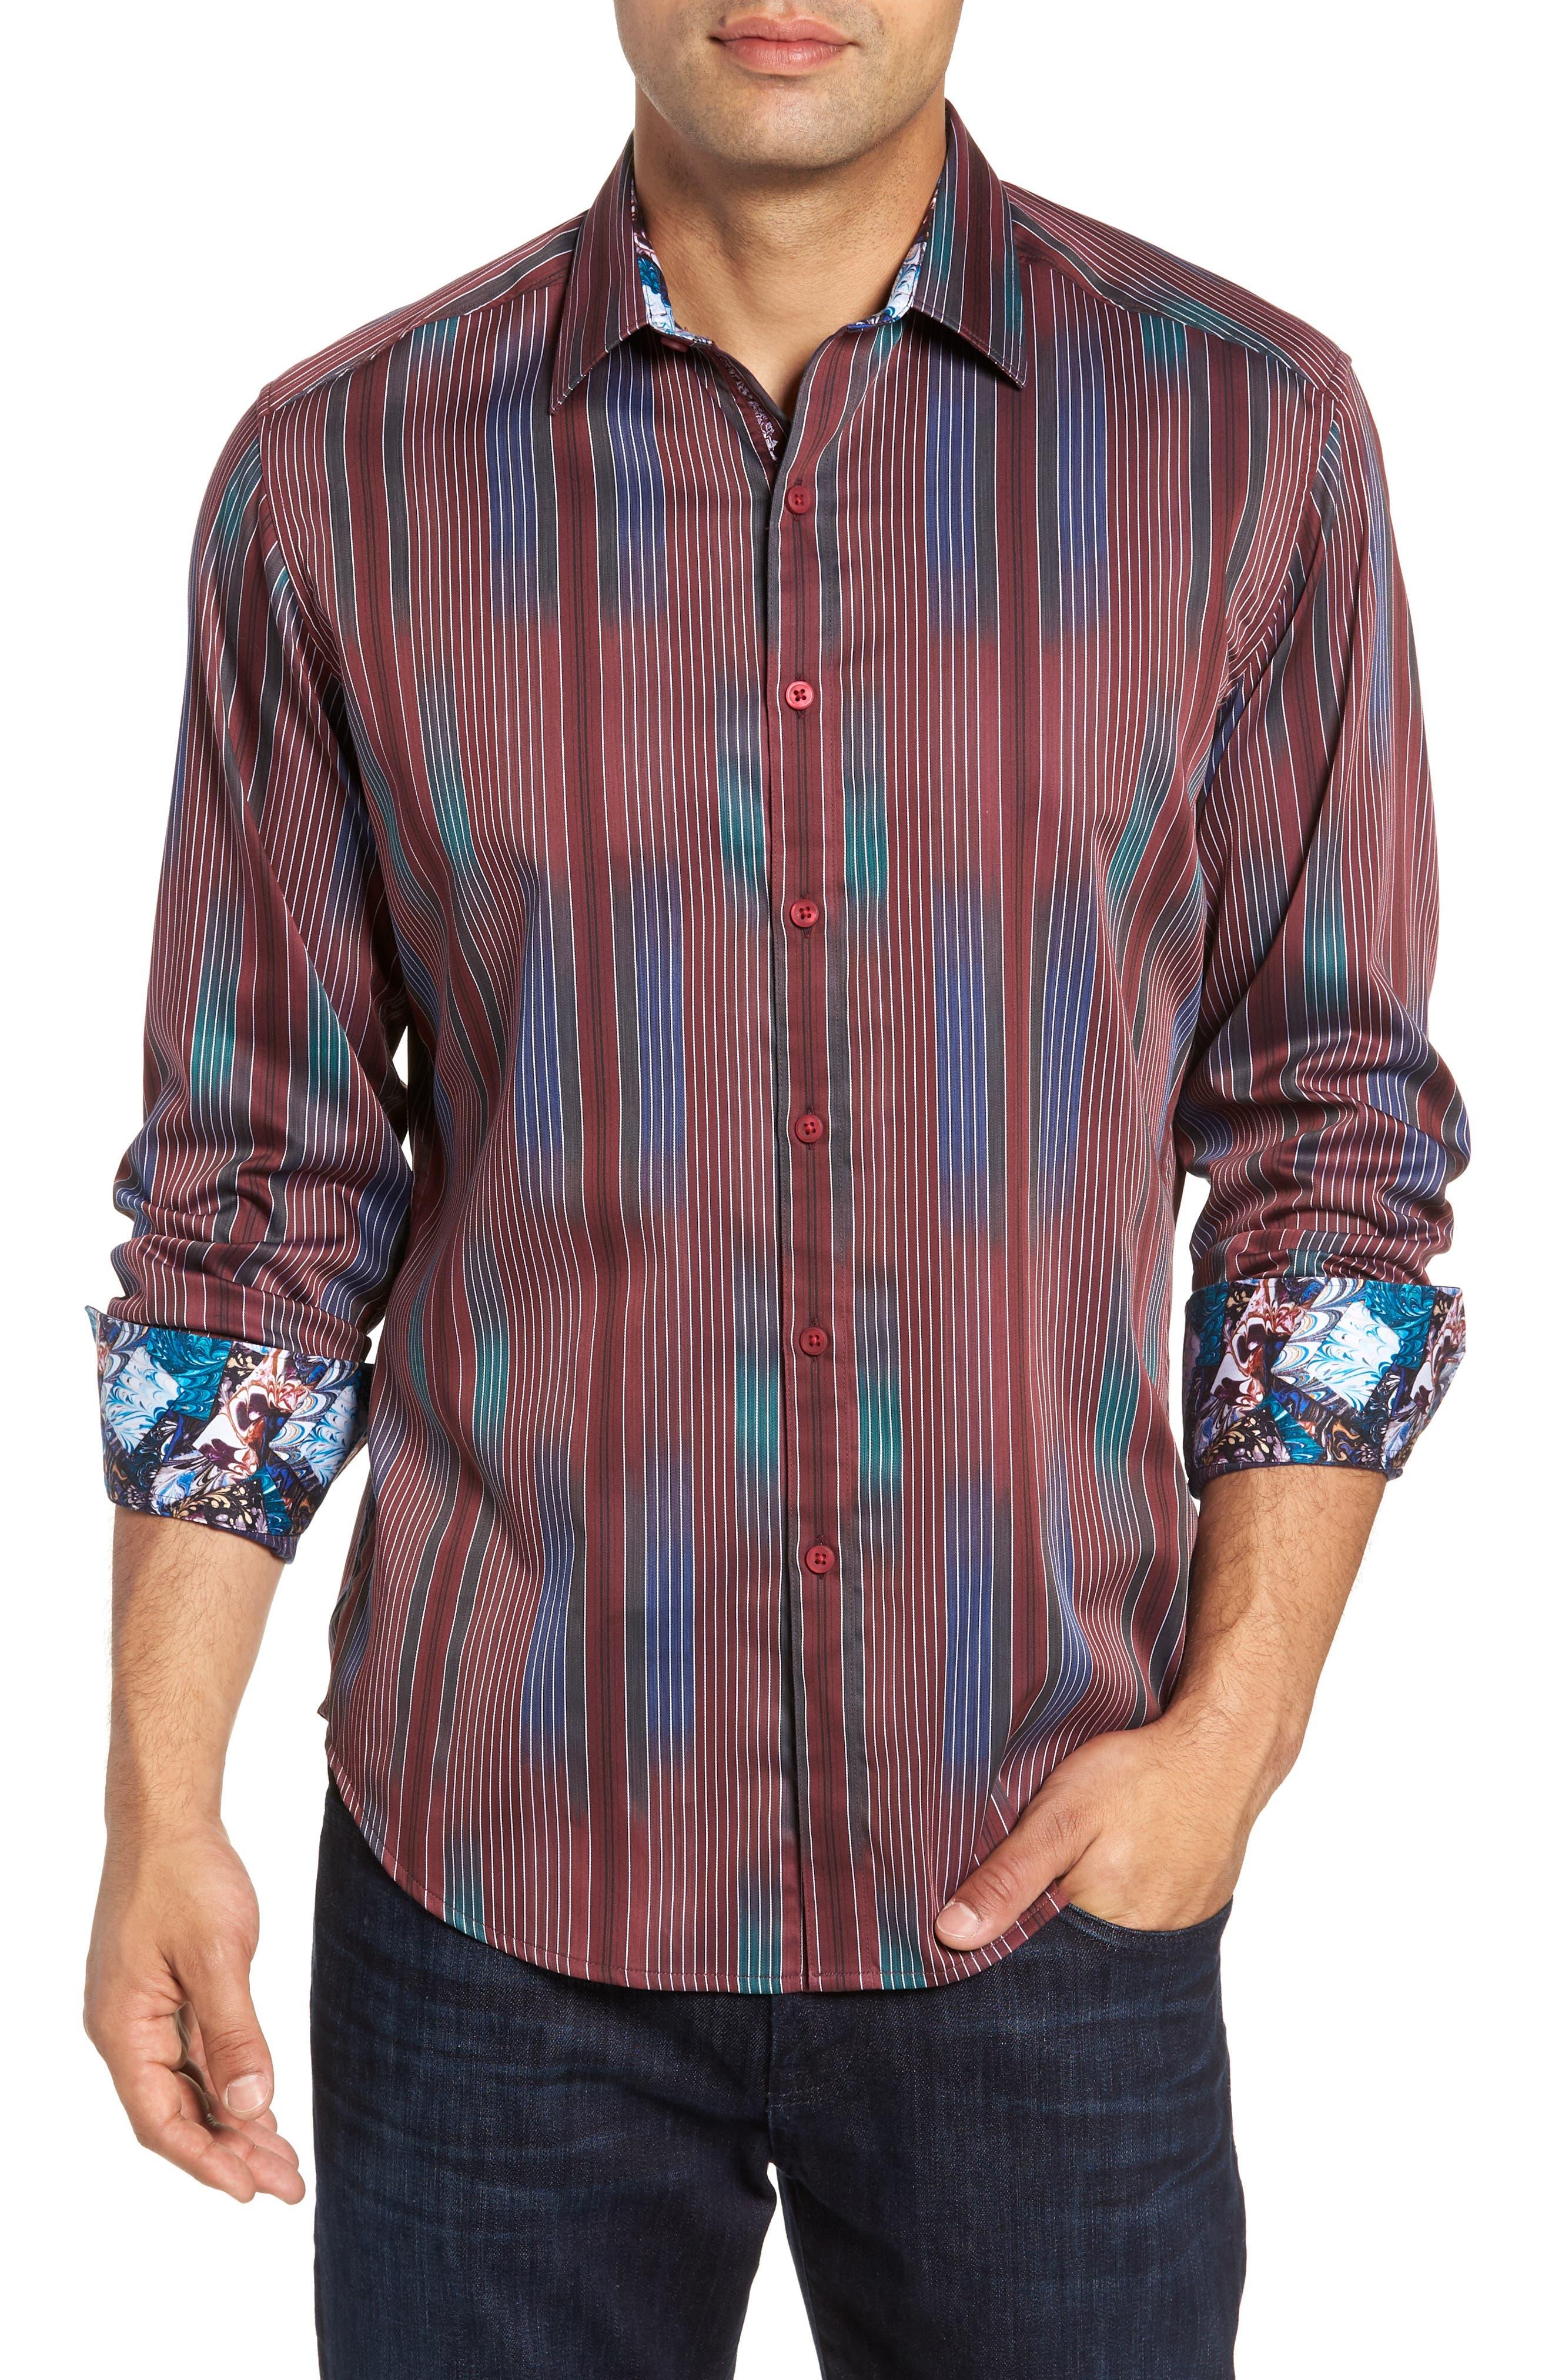 Rahman Classic Fit Sport Shirt,                             Main thumbnail 1, color,                             BURGUNDY